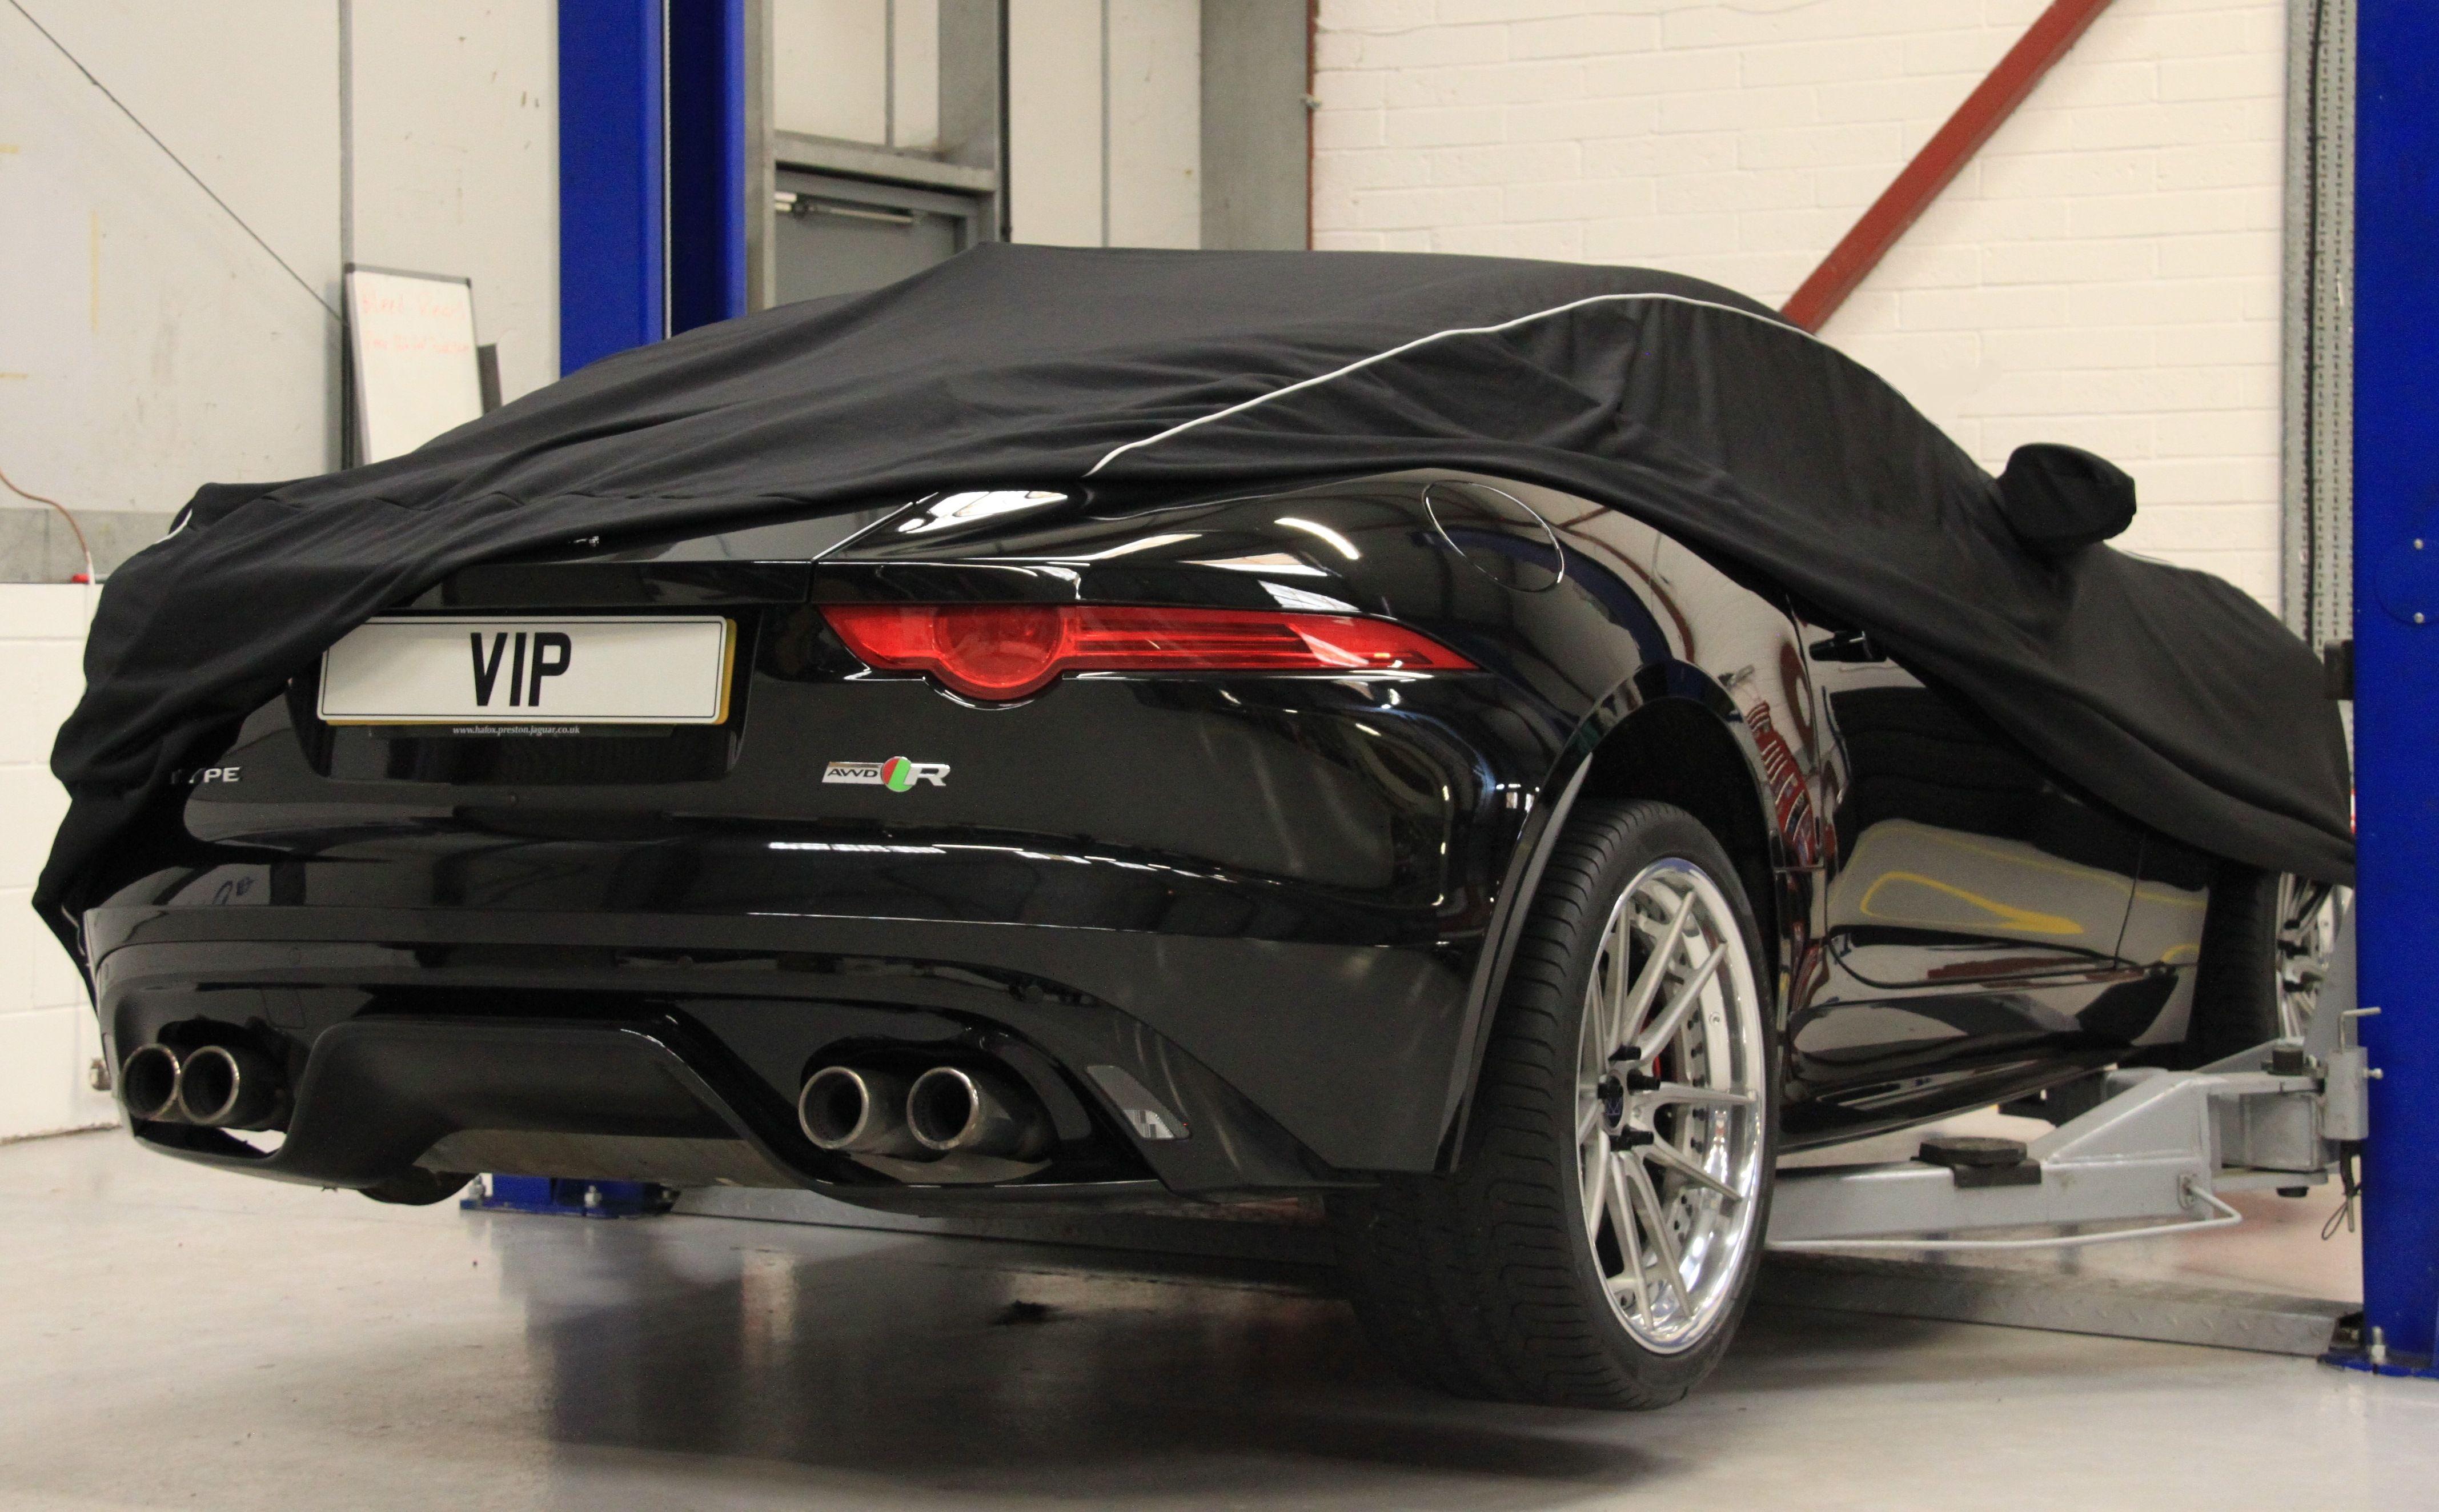 Vip Design Jaguar F Type 650bhp Project Predator Tuning Package